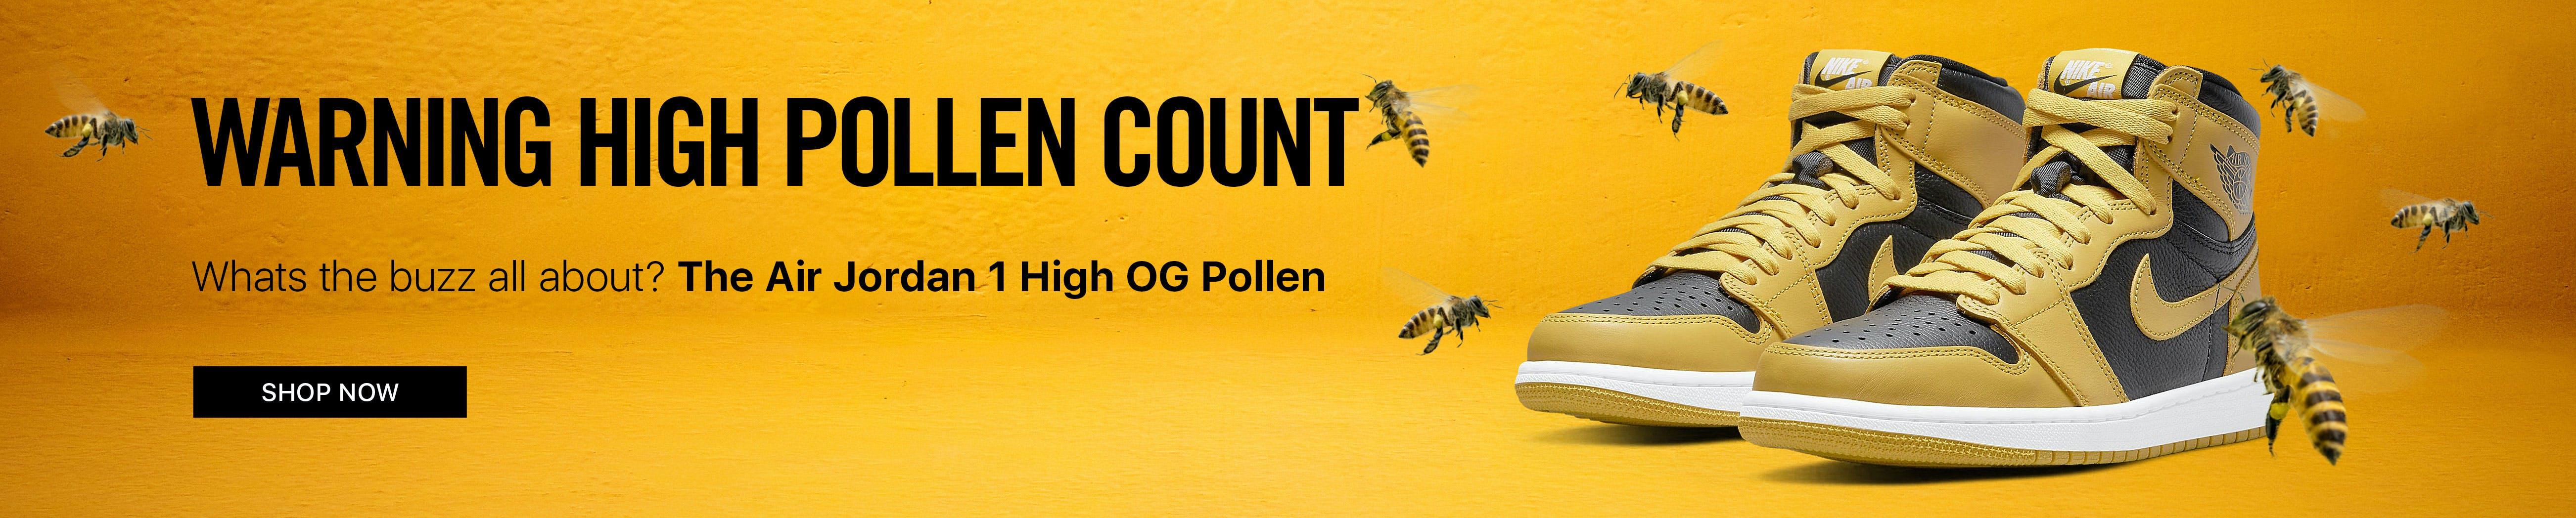 Air Jordan 1 High OG Pollen (2021) KLEKT Sneakers Hype